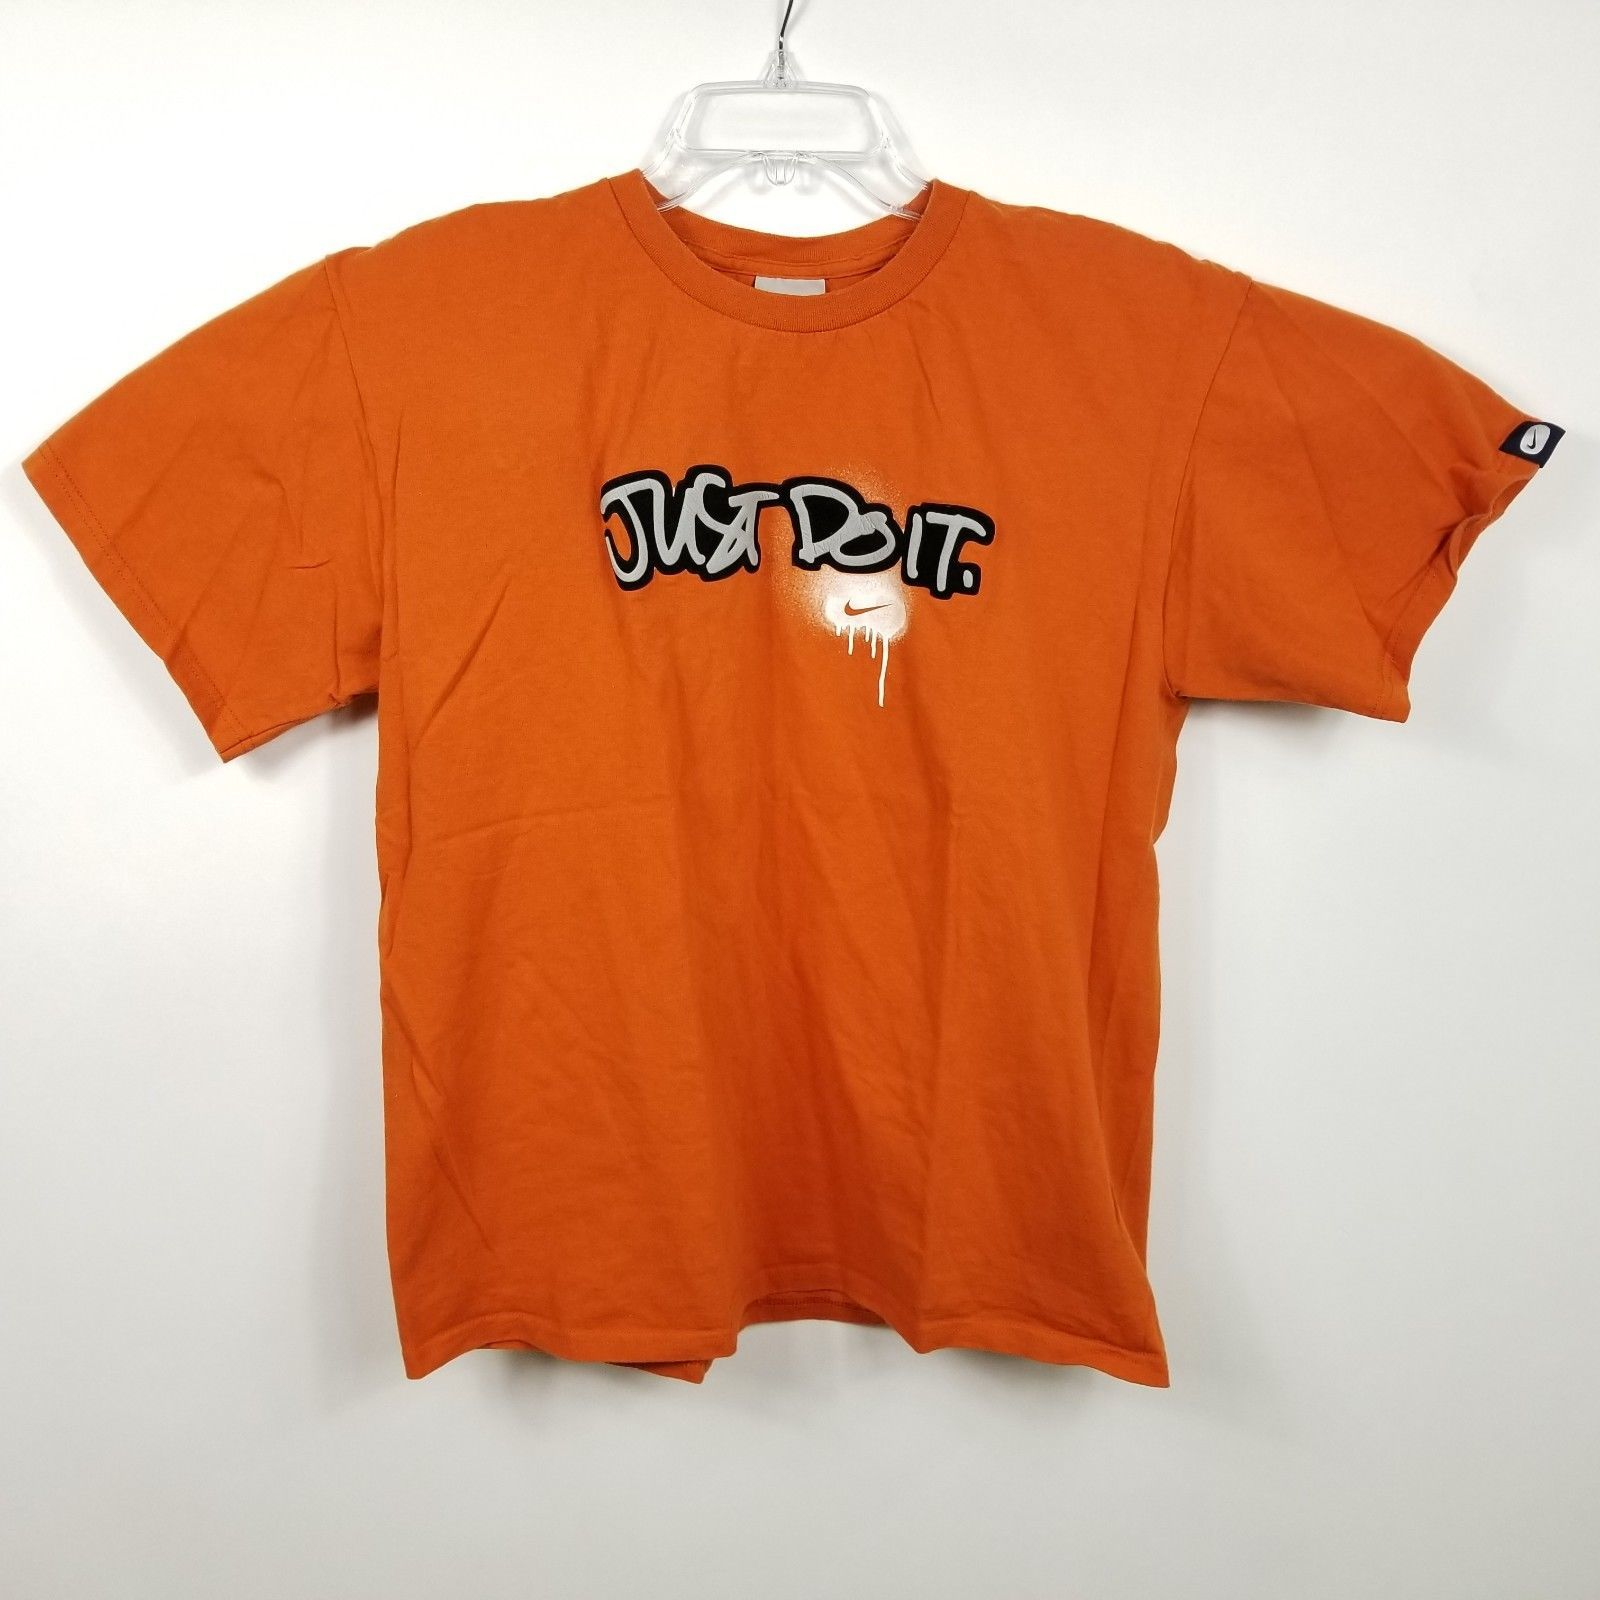 41f1ade8 Nike Mens VTG Just Do It T Shirt Sz L Large and 50 similar items. 57